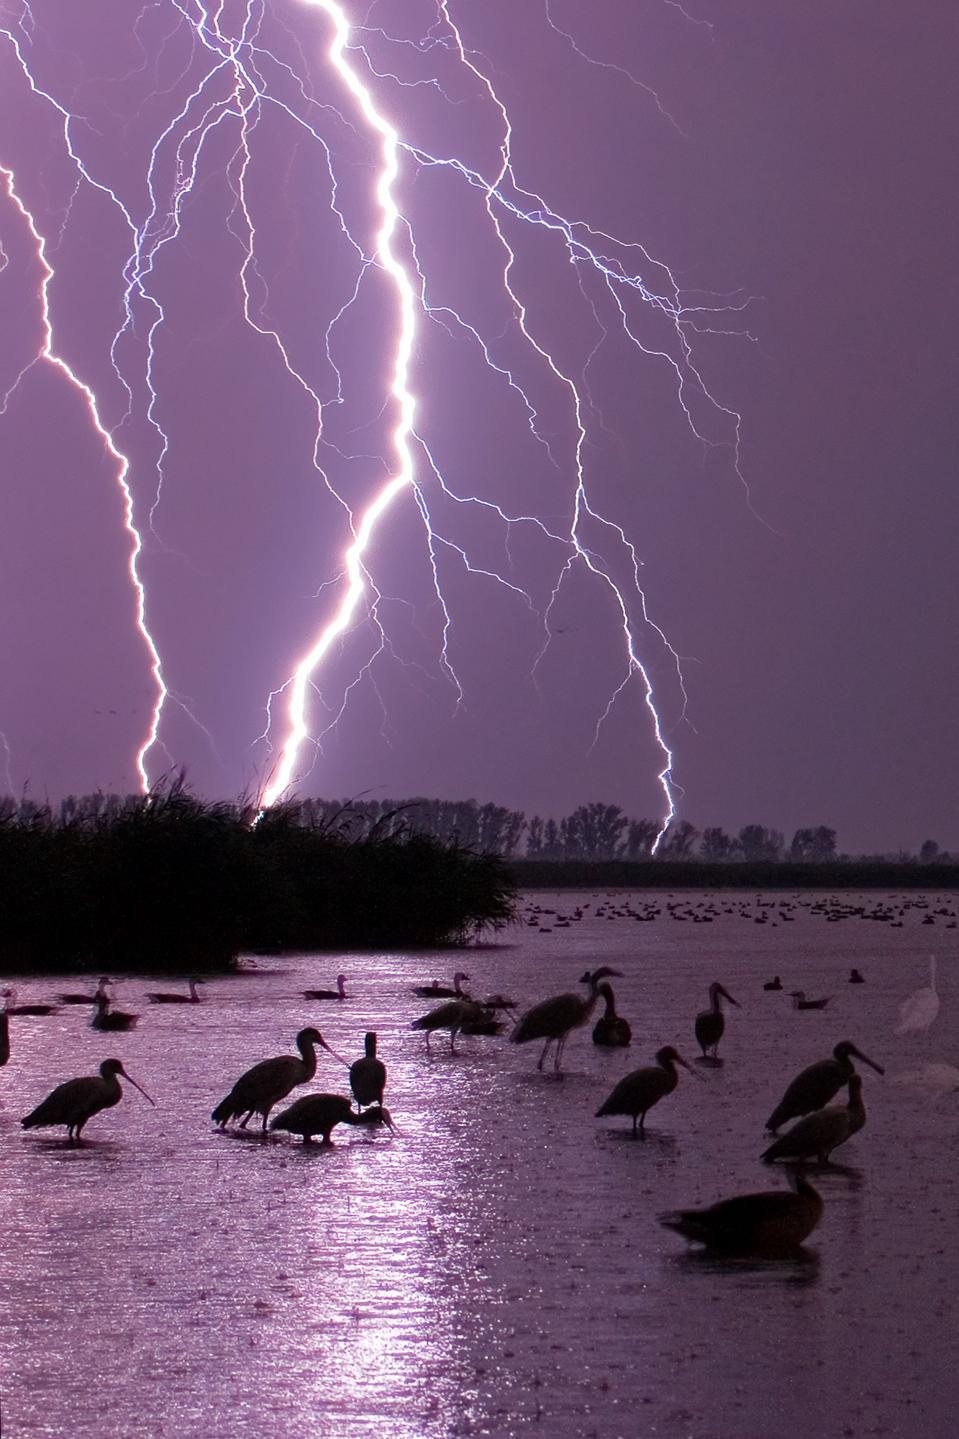 Wading birds illuminated by flashes of forked lightning.